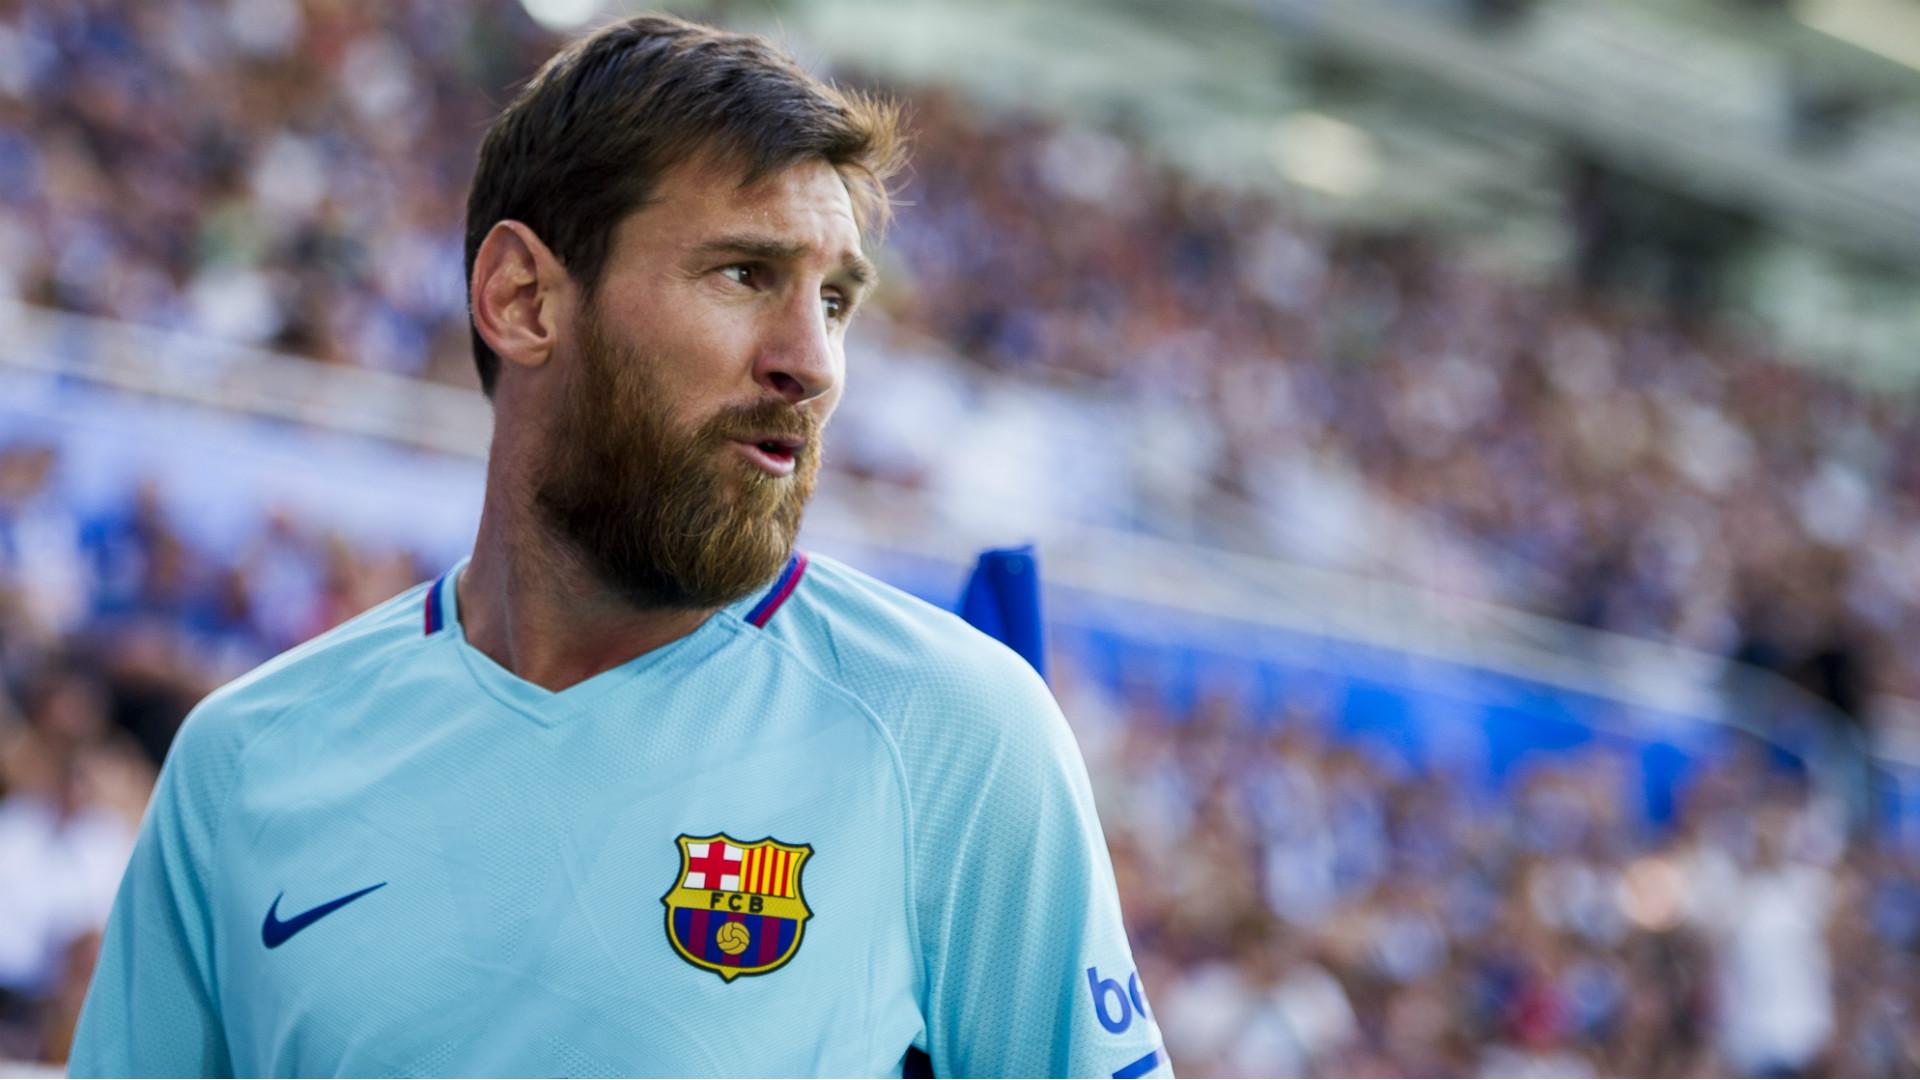 Lionel-messi-barcelona_prmcg8bmeii01x4tewgj1go0d